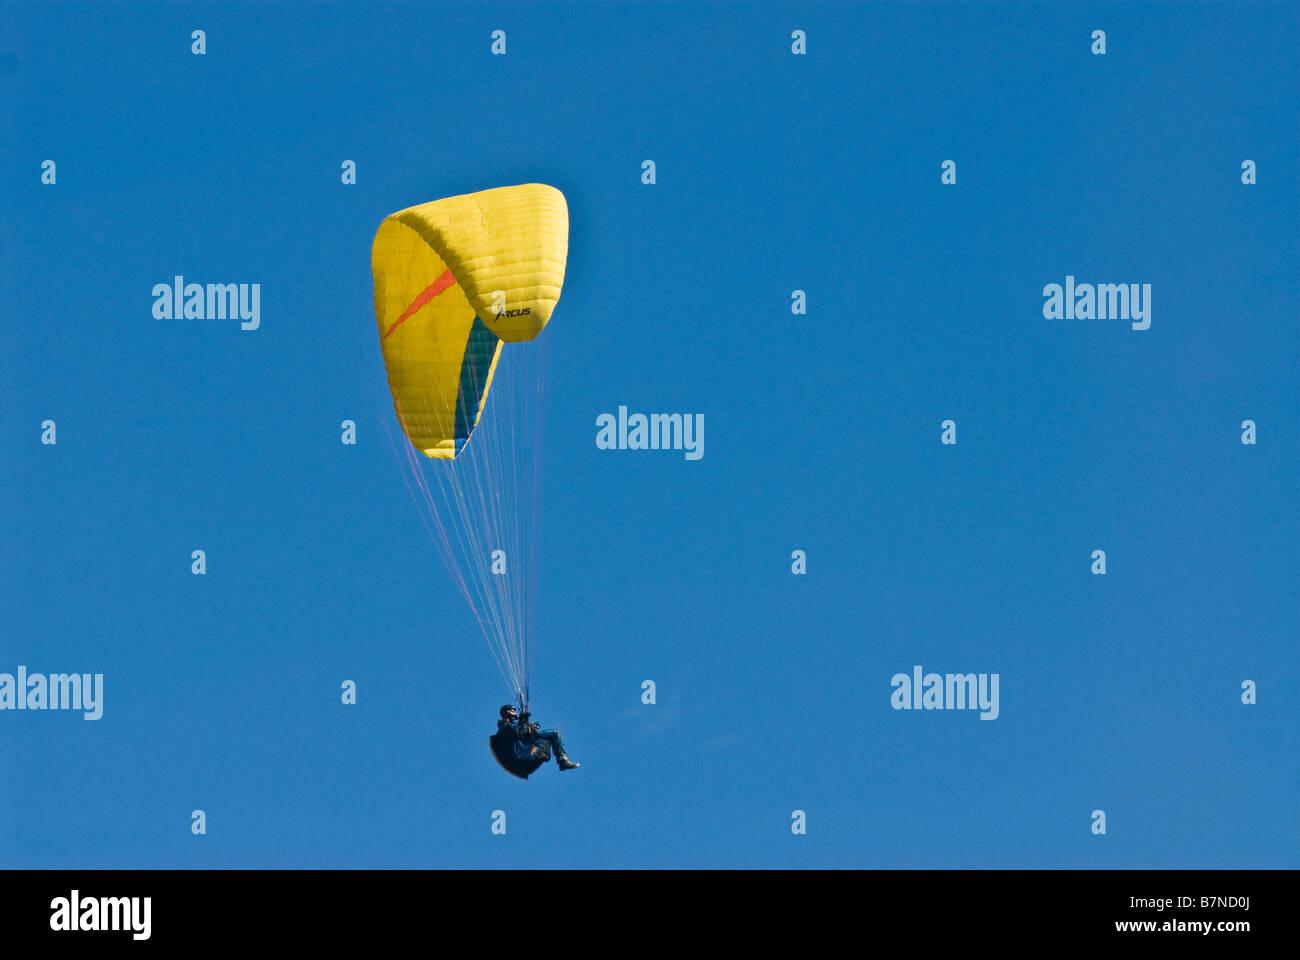 hang glider soaring in sky - Stock Image